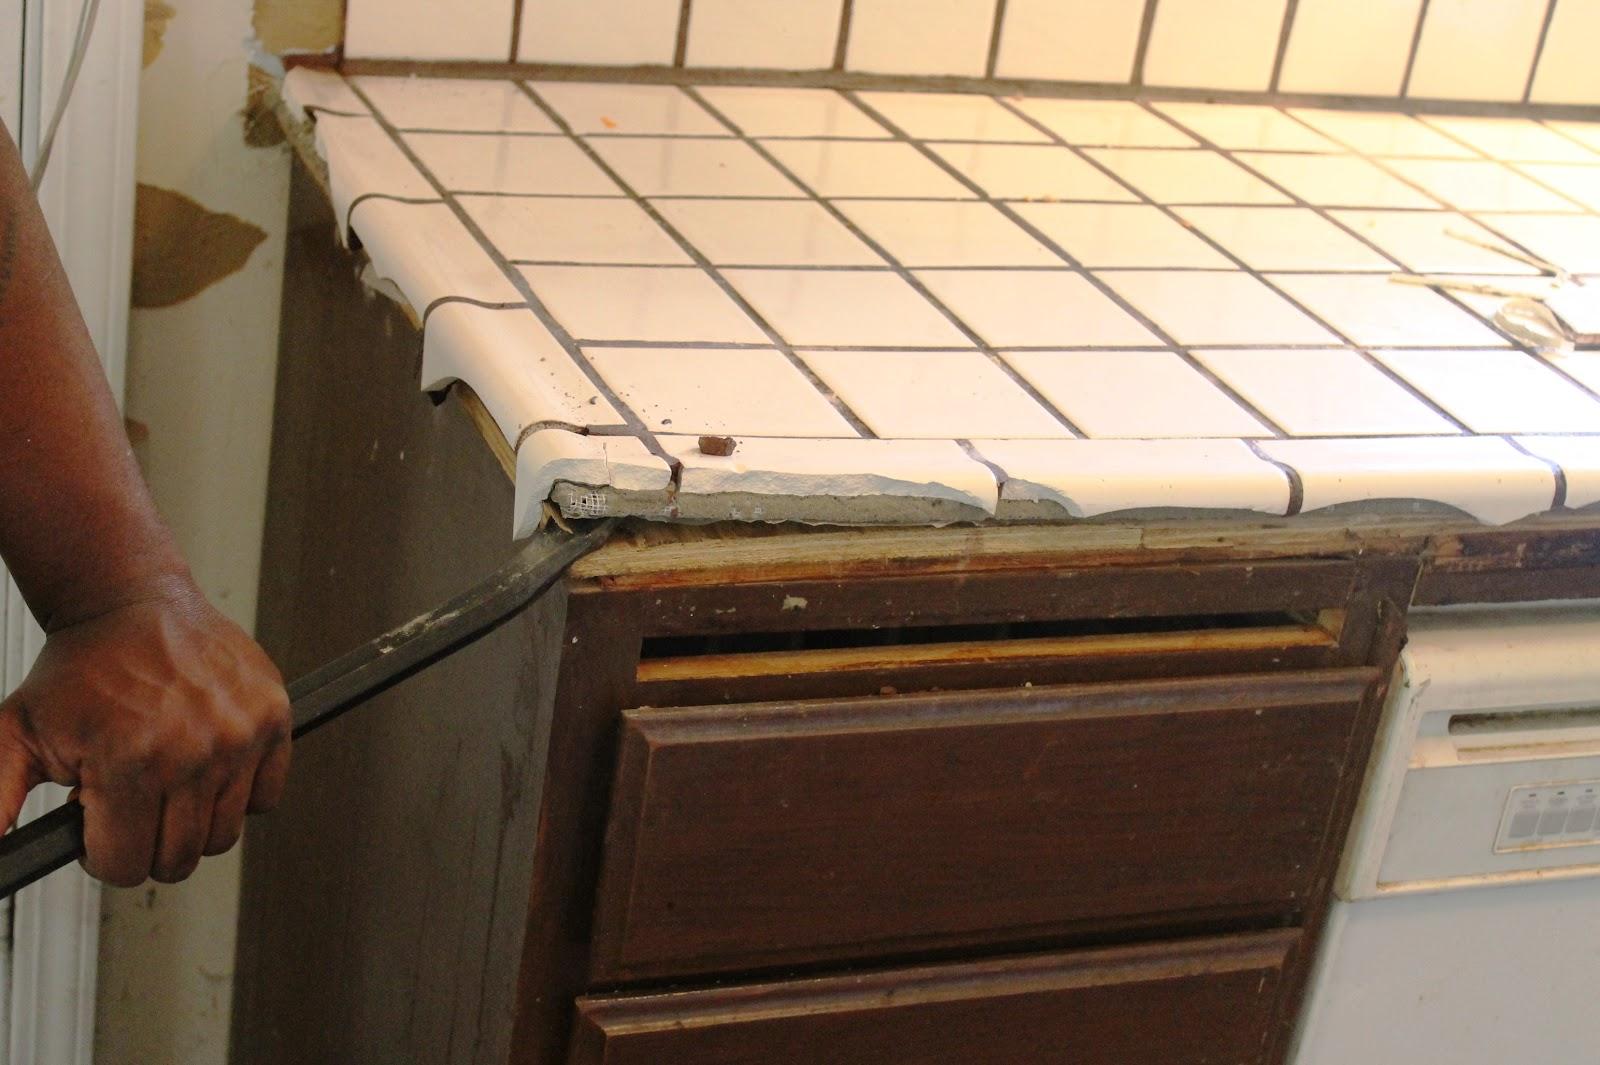 removing a countertop - newcountertop